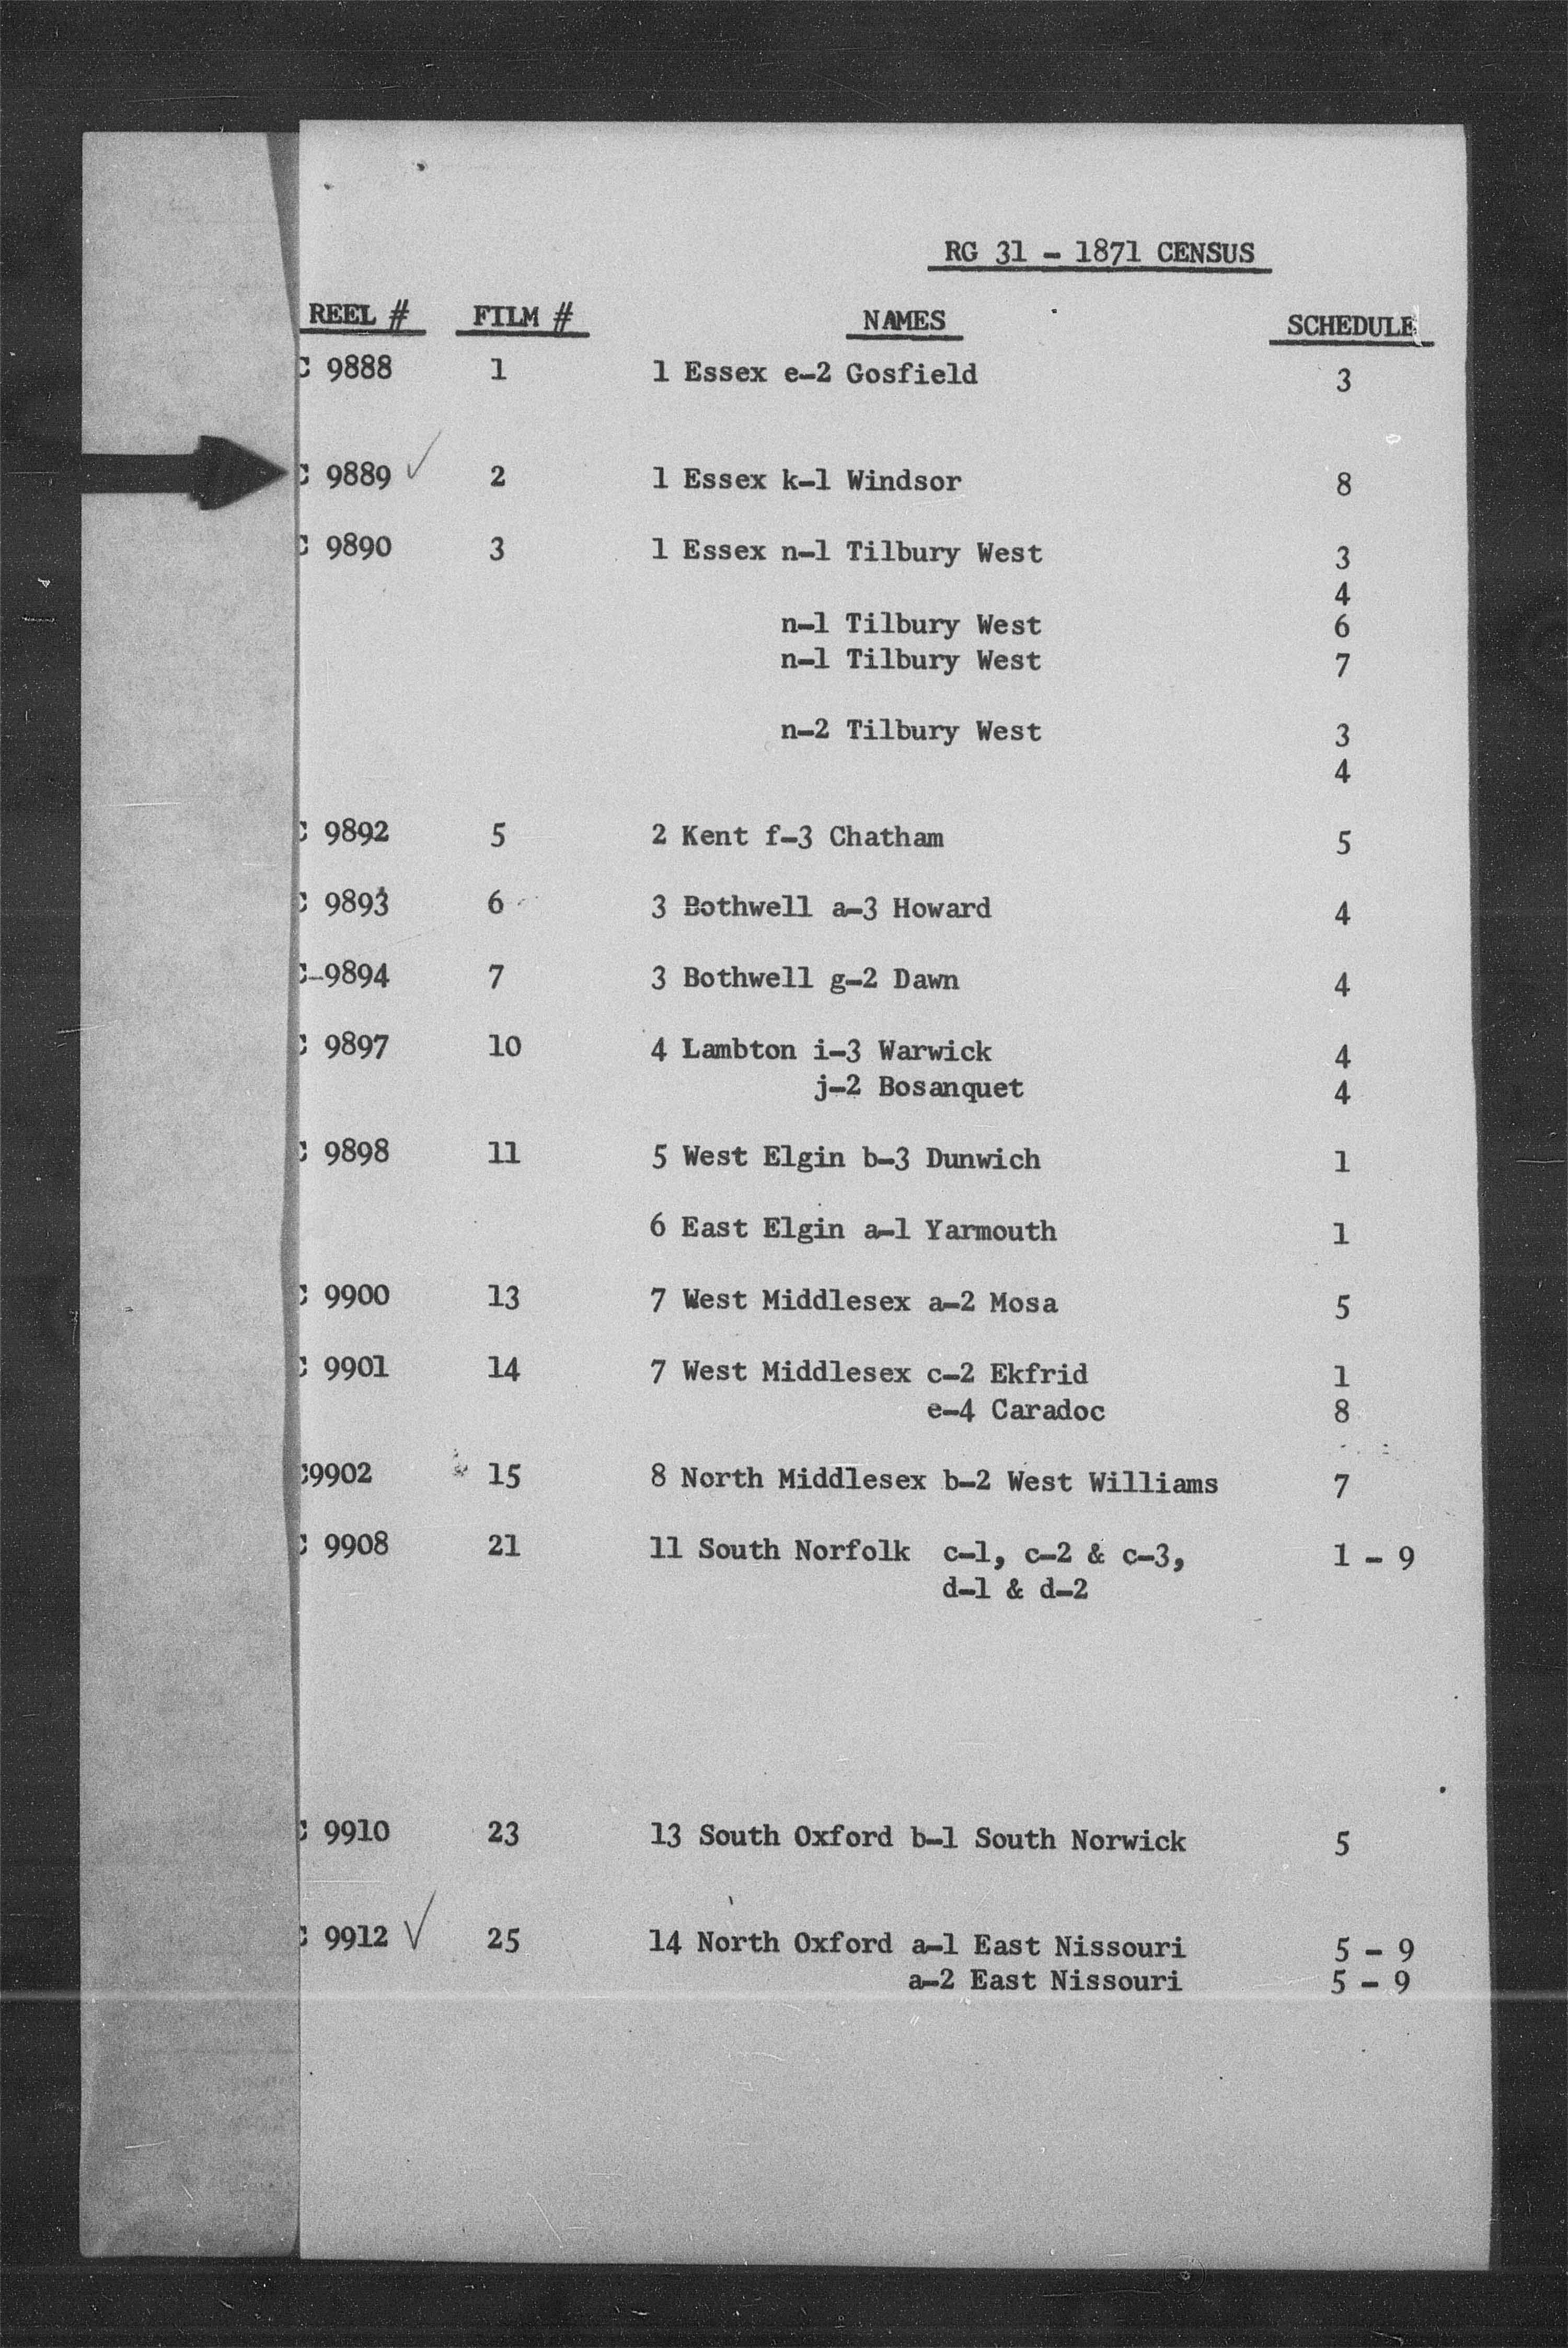 Titre: Recensement du Canada (1871) - N° d'enregistrement Mikan: 194056 - Microforme: c-9889